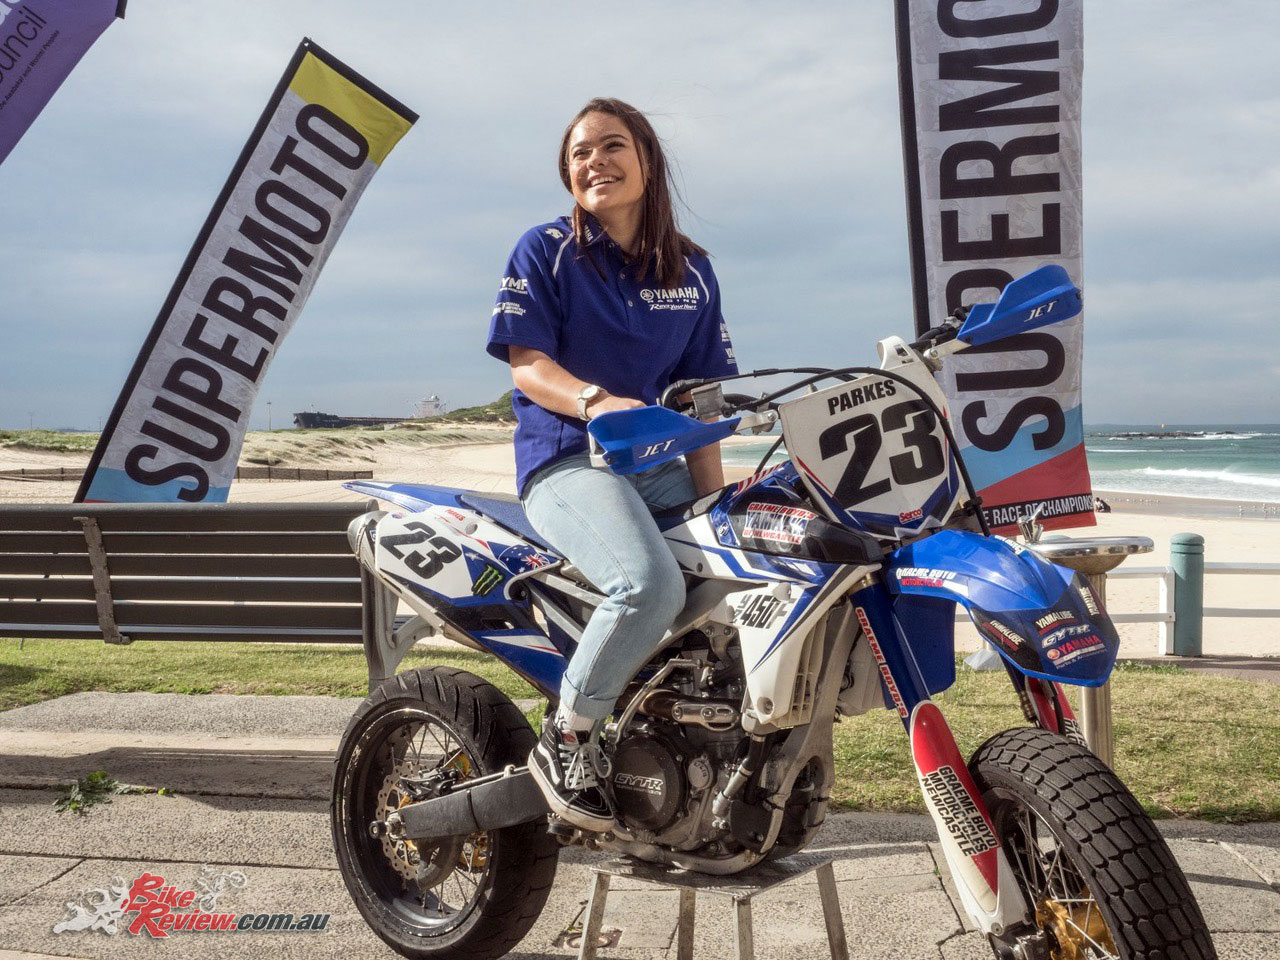 Keegan Pickering at the 2018 Newcastle International SuperMoto launch